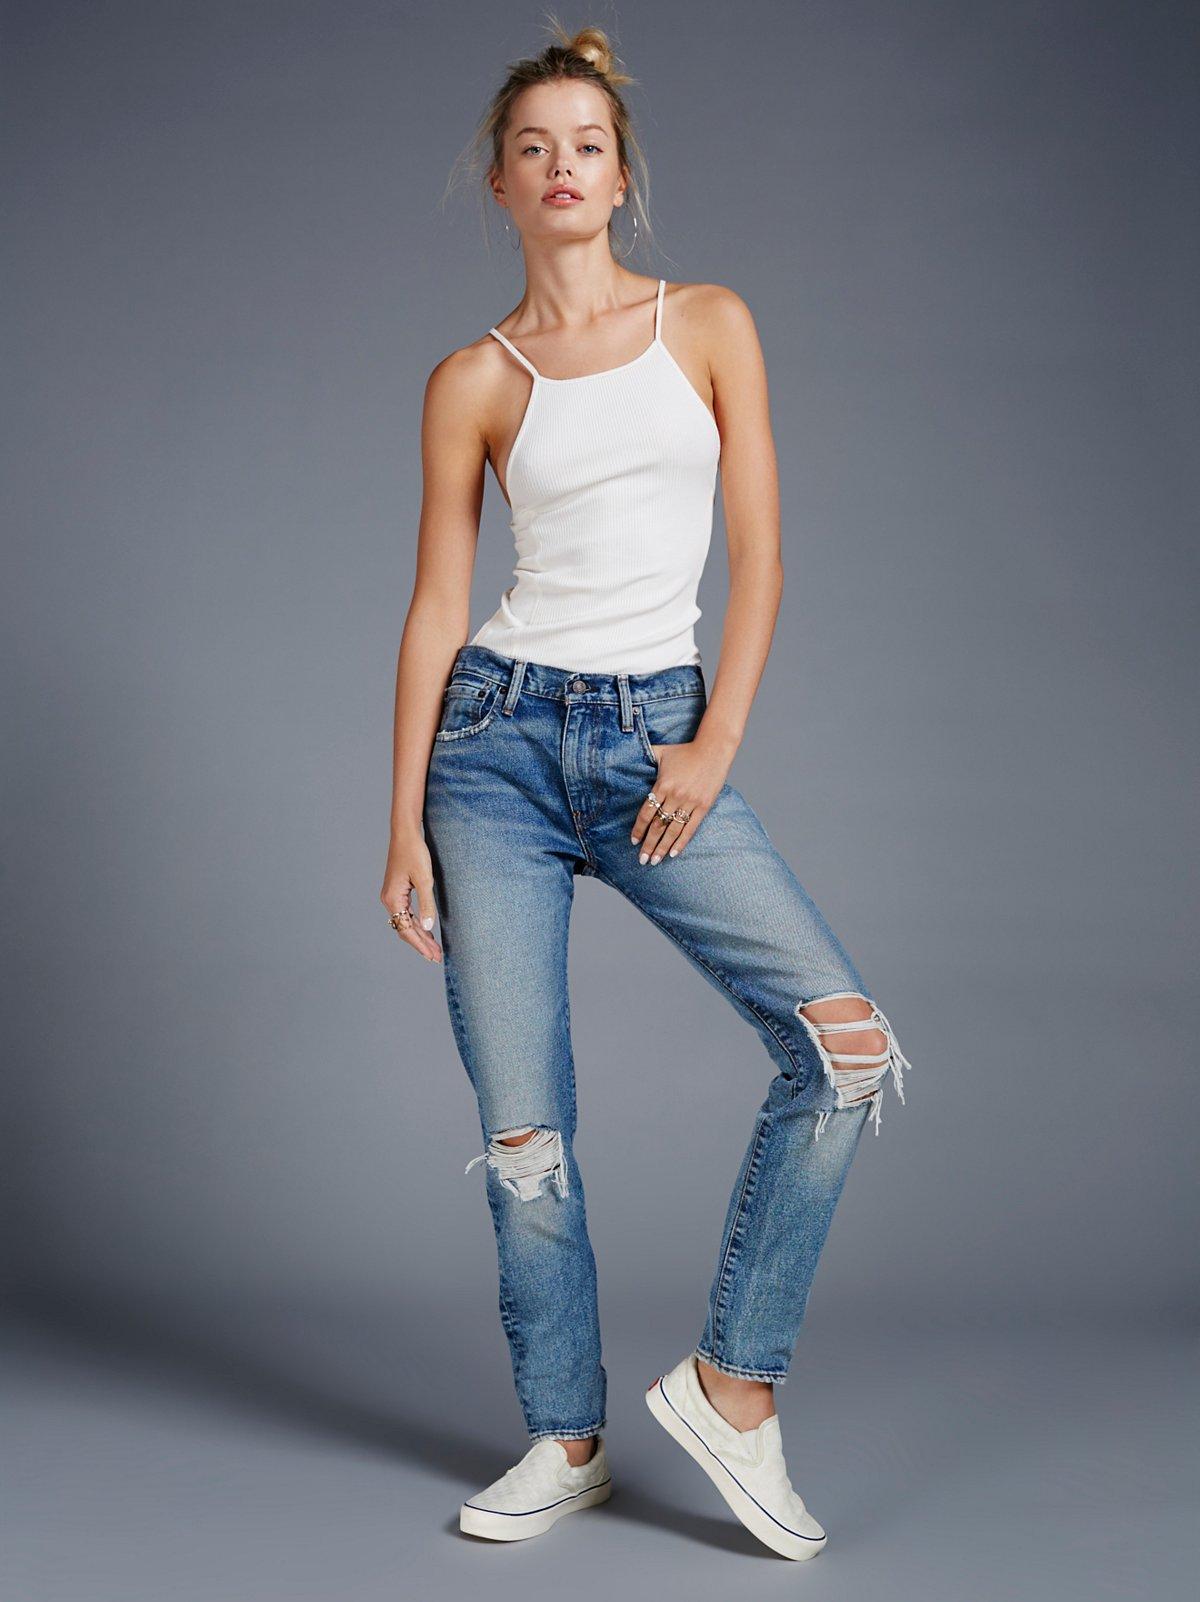 Levi's 505c牛仔裤